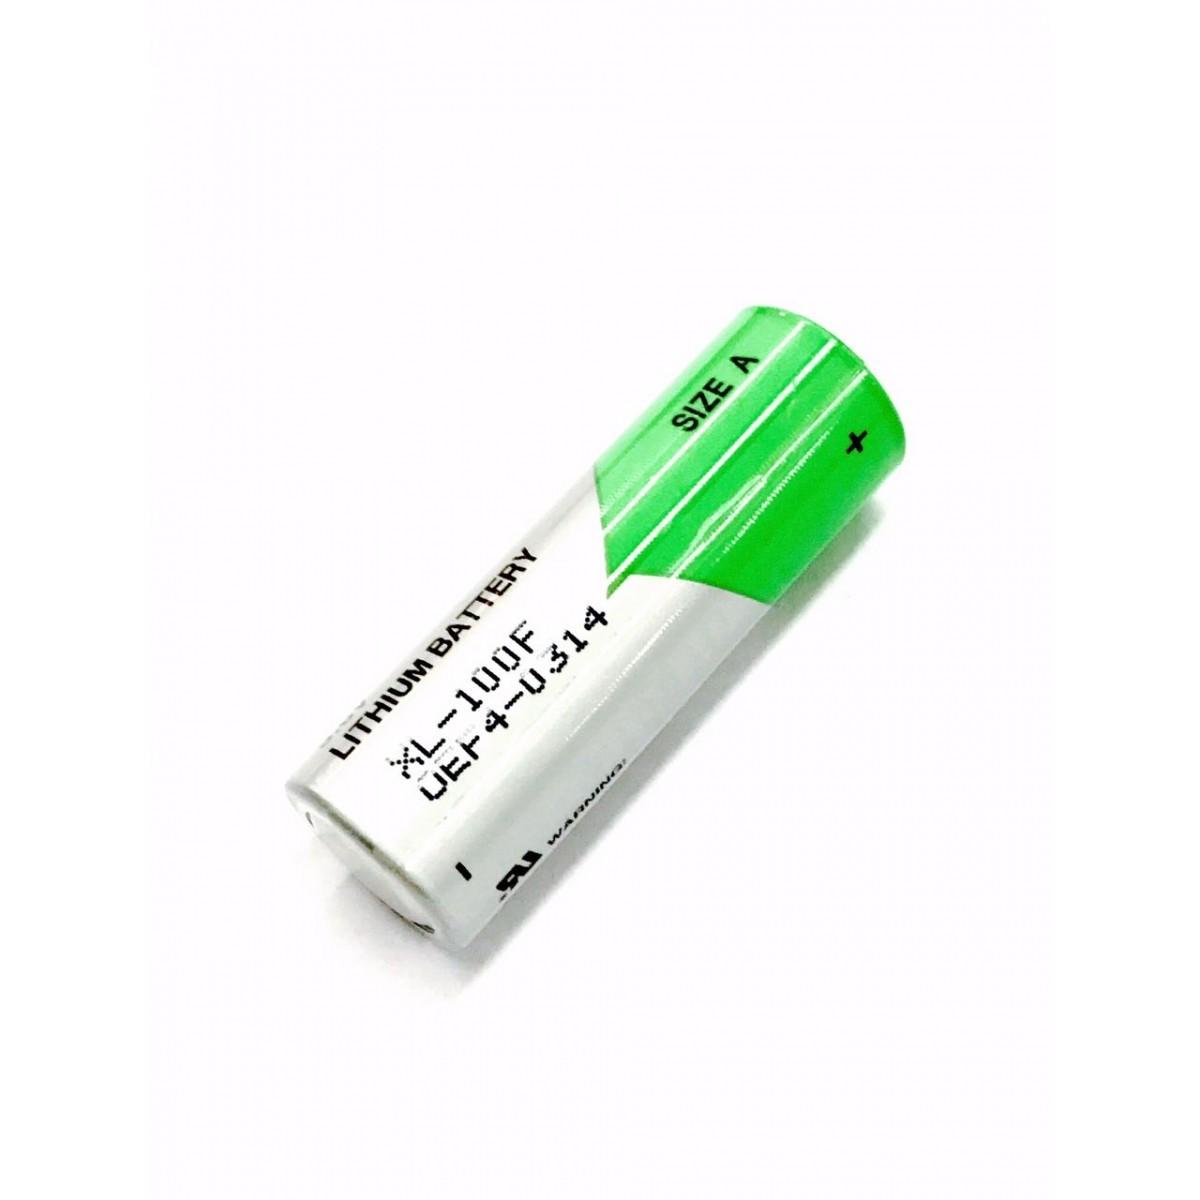 BATERIA XENO 17500 3,6V LITHIUM